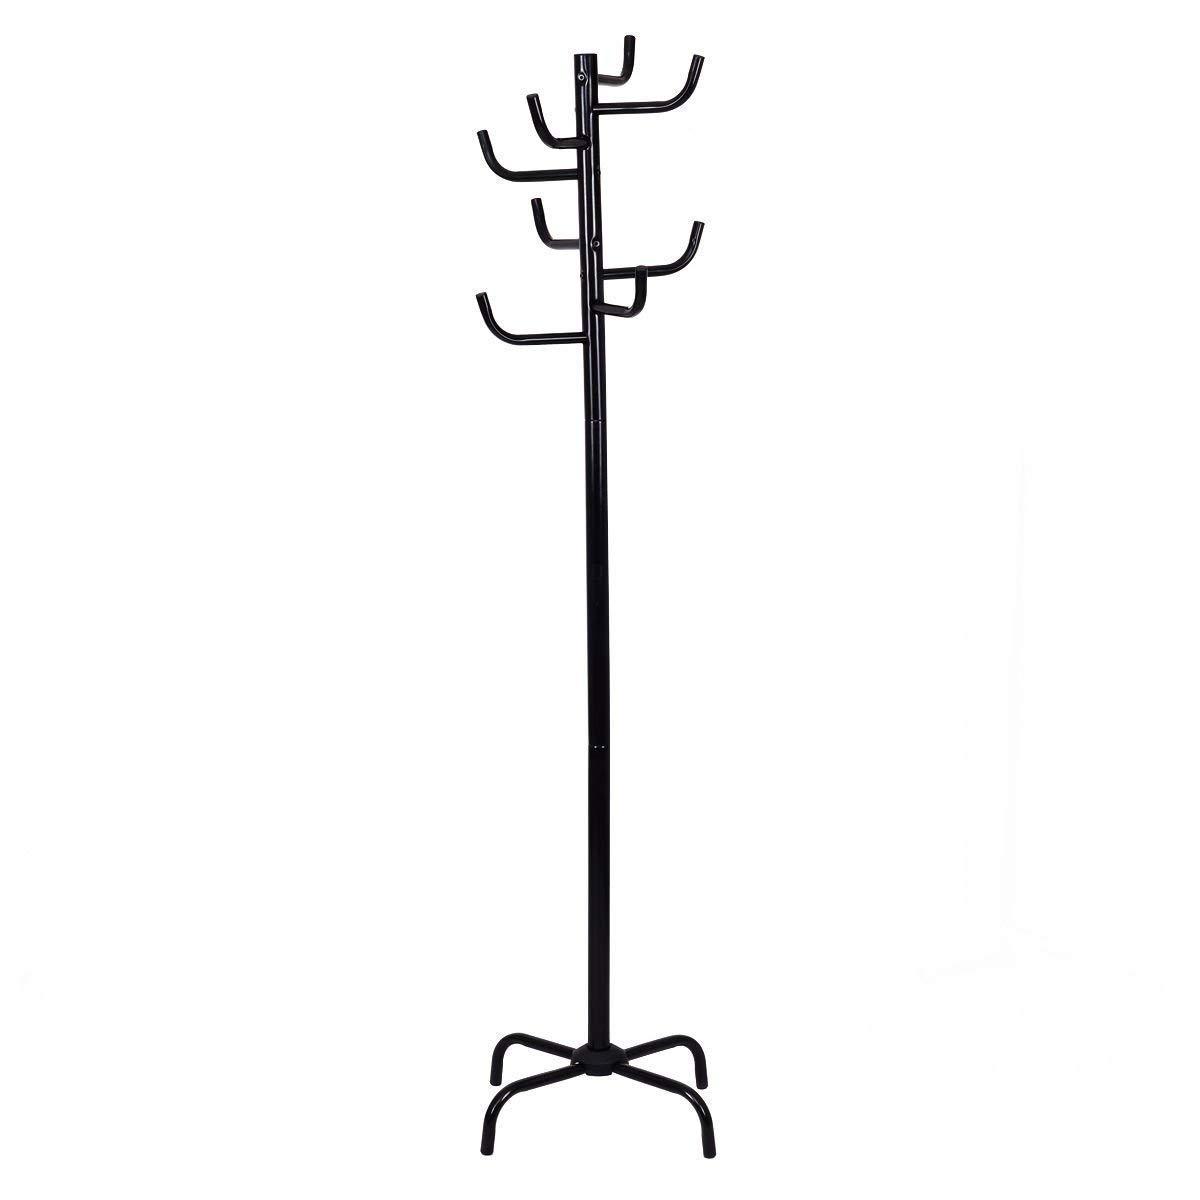 TANGKULA Entryway Coat Rack Coat Tree Hat Jacket Hanger Holder Heavy Duty Free Standing Clothing Rack for Bedroom Living Room Office Hat Coat Umbrella Stand Tree, Back